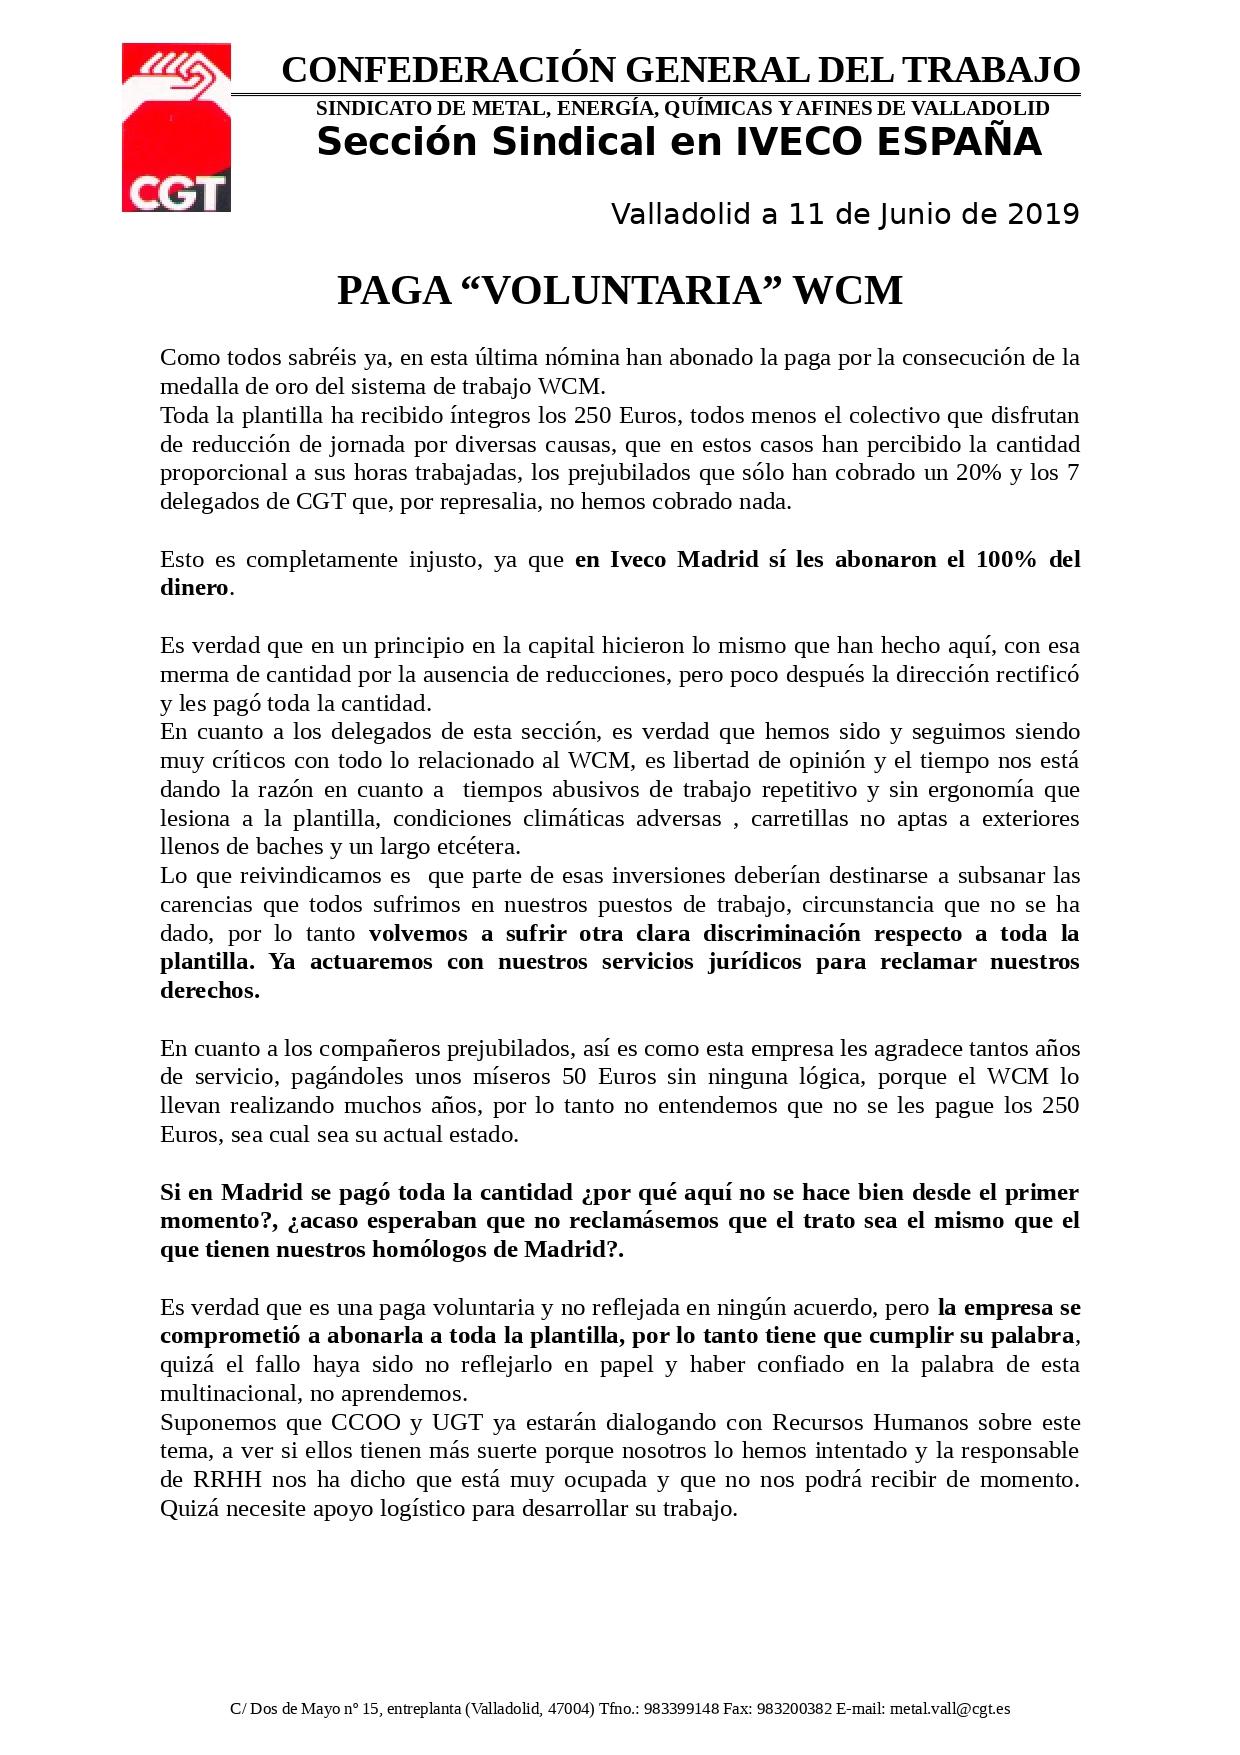 PAGA WCM(1)_page-0001